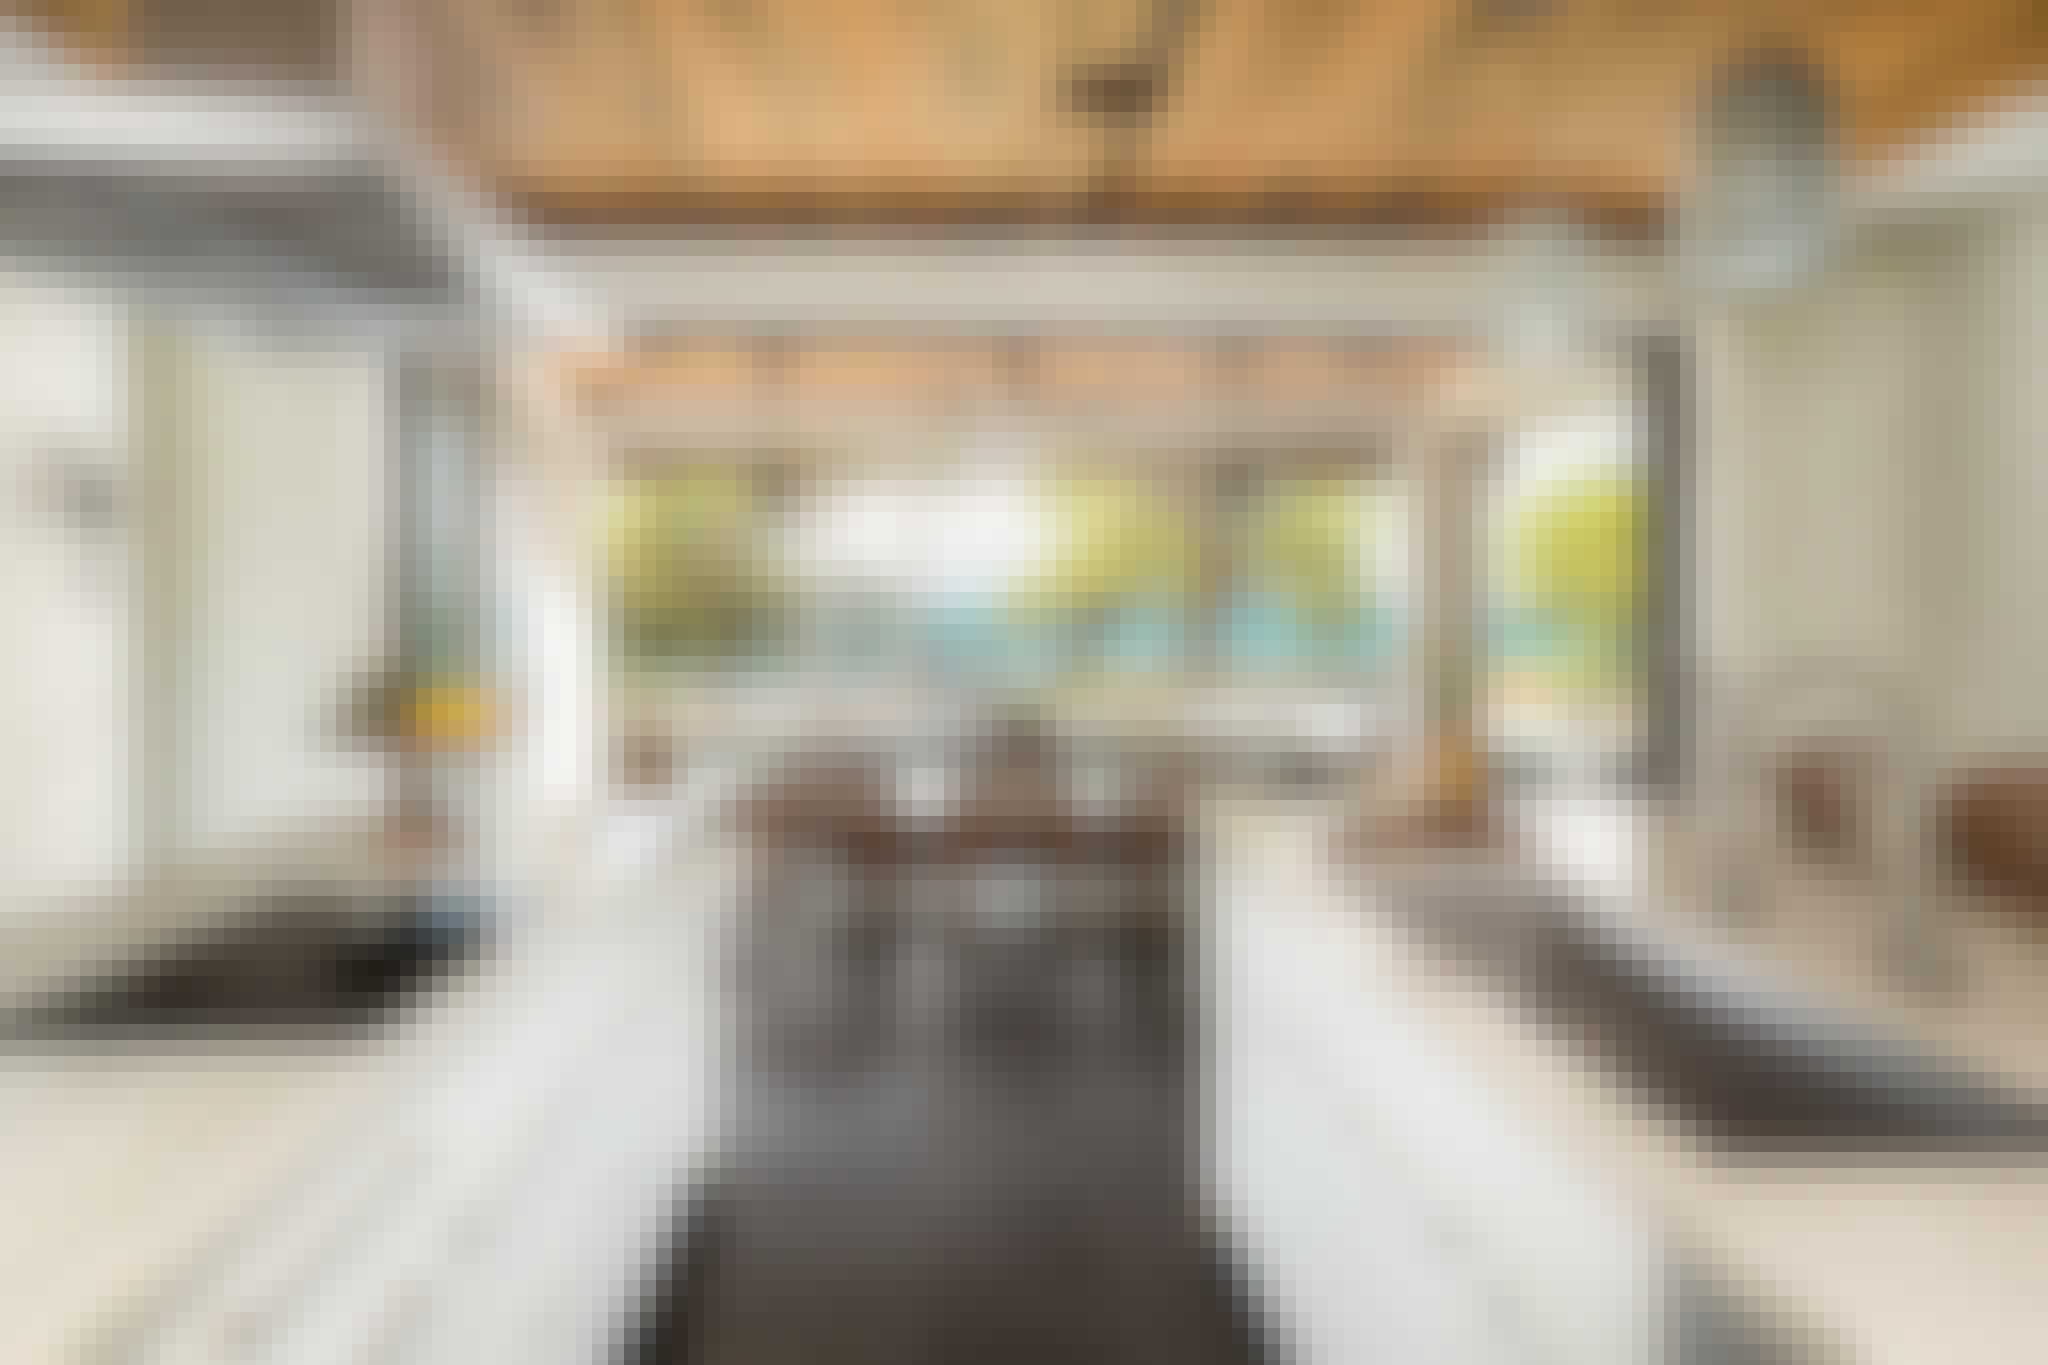 retractable glass walls in kitchen design